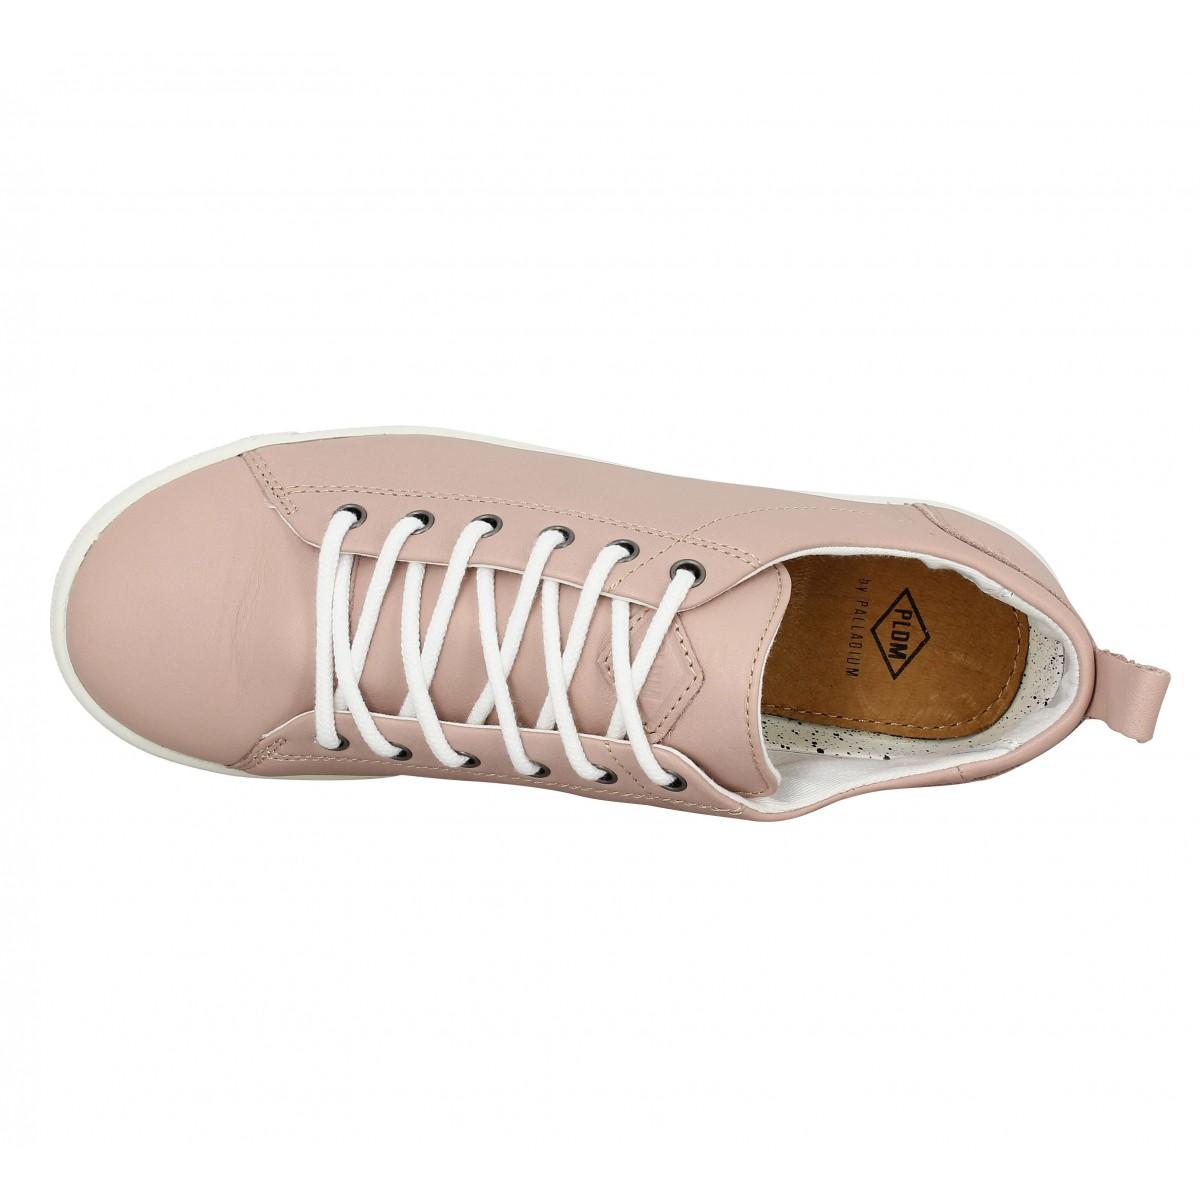 Palladium Pldm Bel By Chaussures Fanny Rose Femme Cuir O1ca8qxw Nca shQrdxtCB